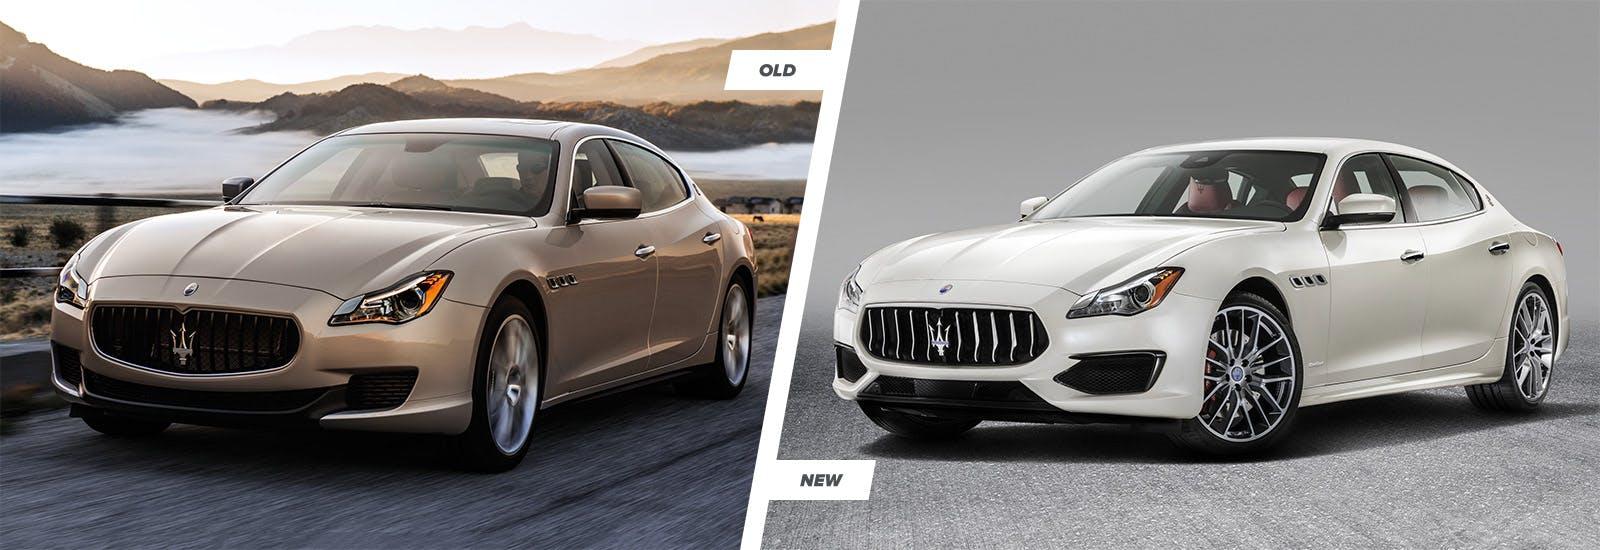 Maserati Quattroporte facelift: old vs new   carwow